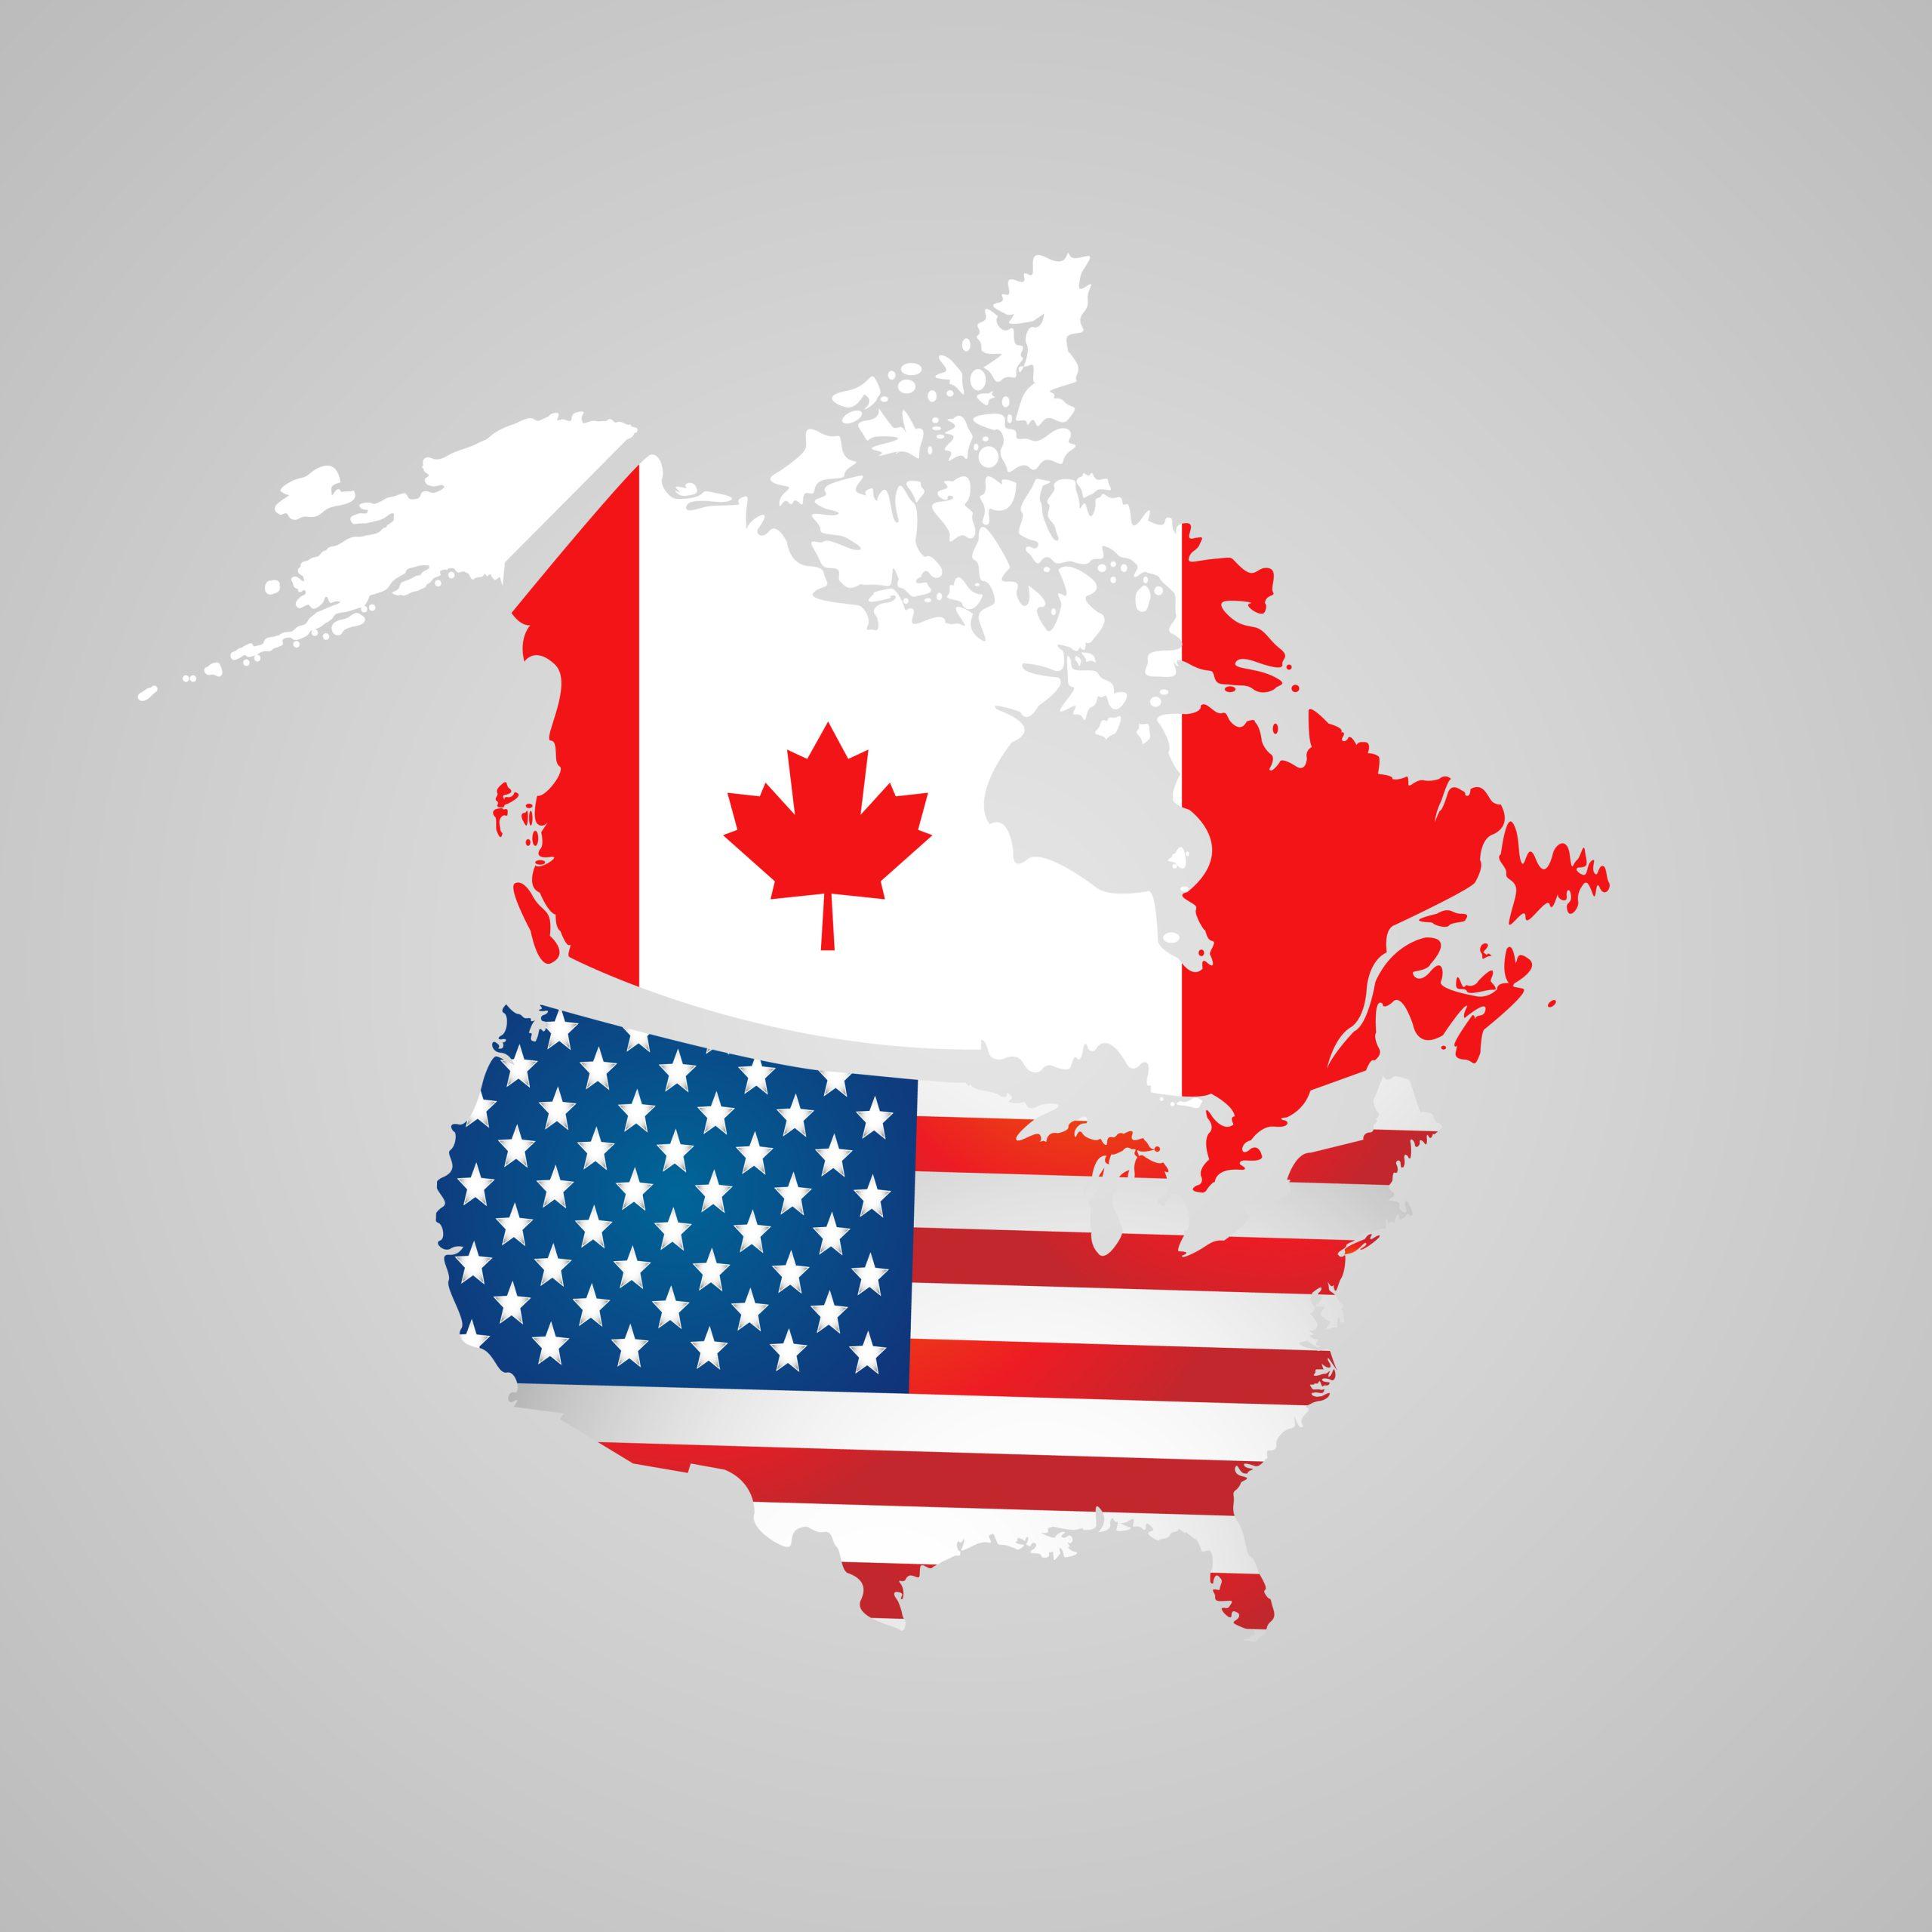 Importers/exporters face 'big regulatory change'